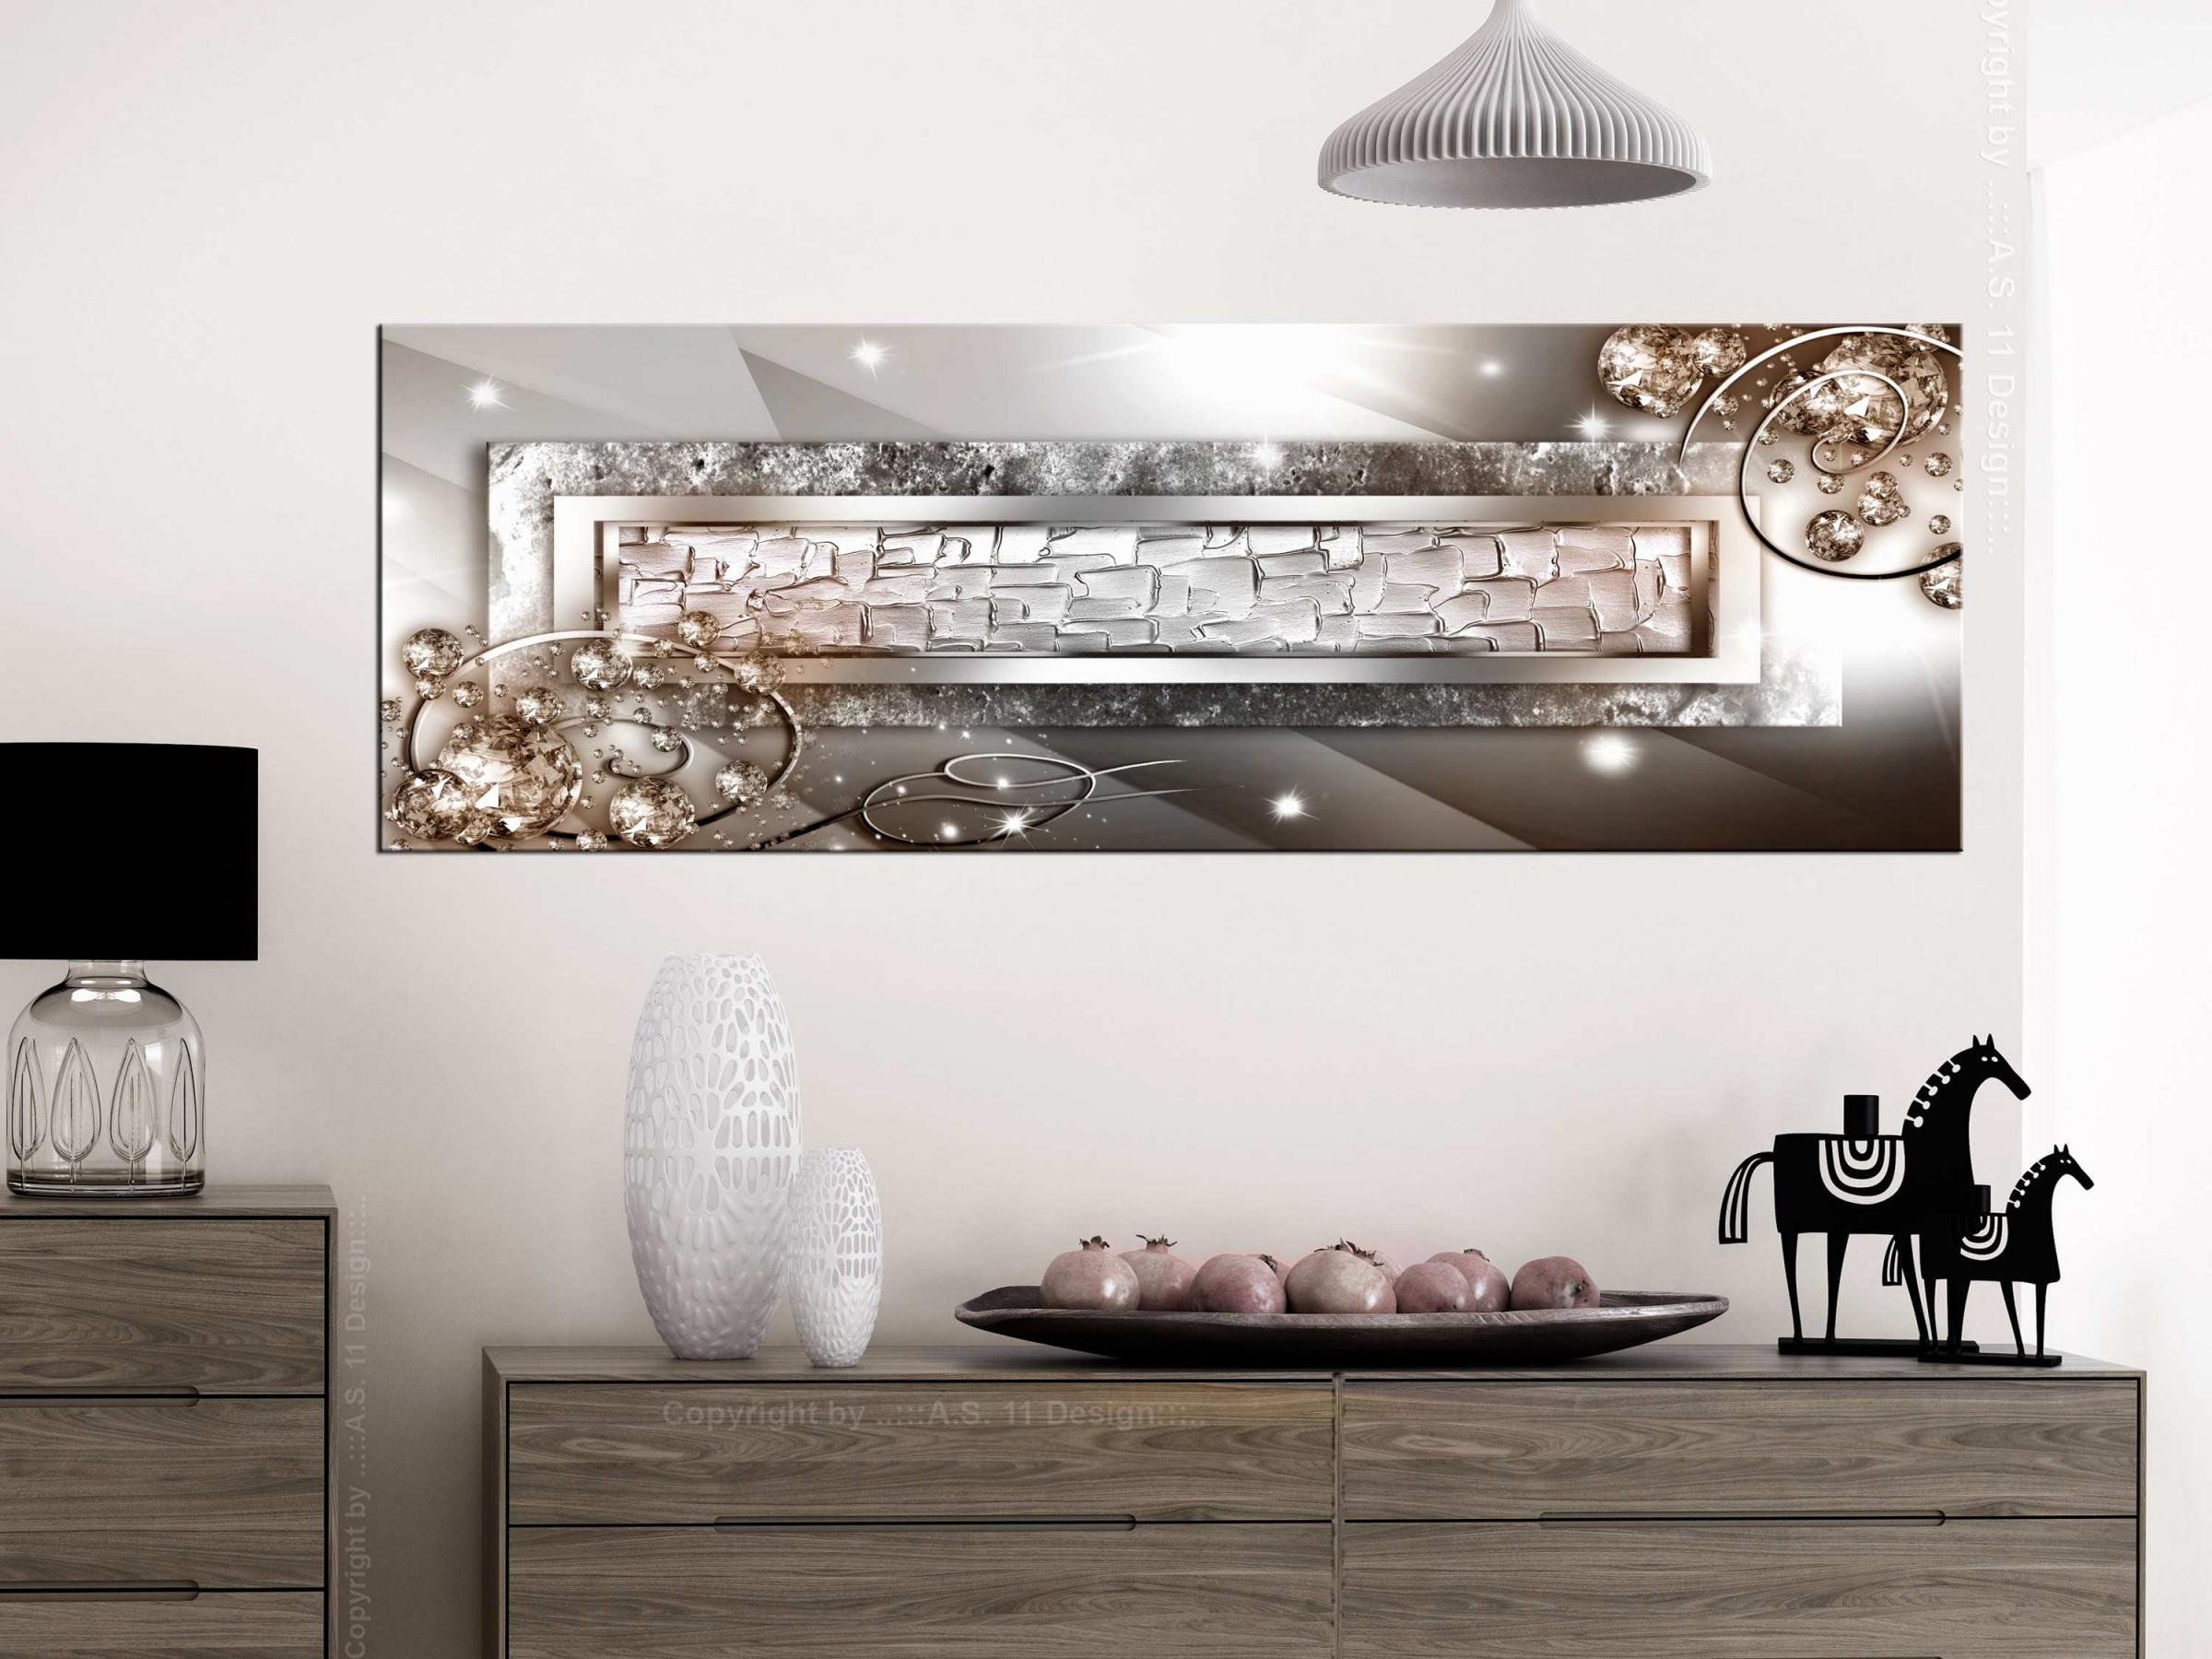 3D Wandbilder Wohnzimmer Einzigartig 80 Neu Bild Von Bilder von 3D Bilder Wohnzimmer Bild